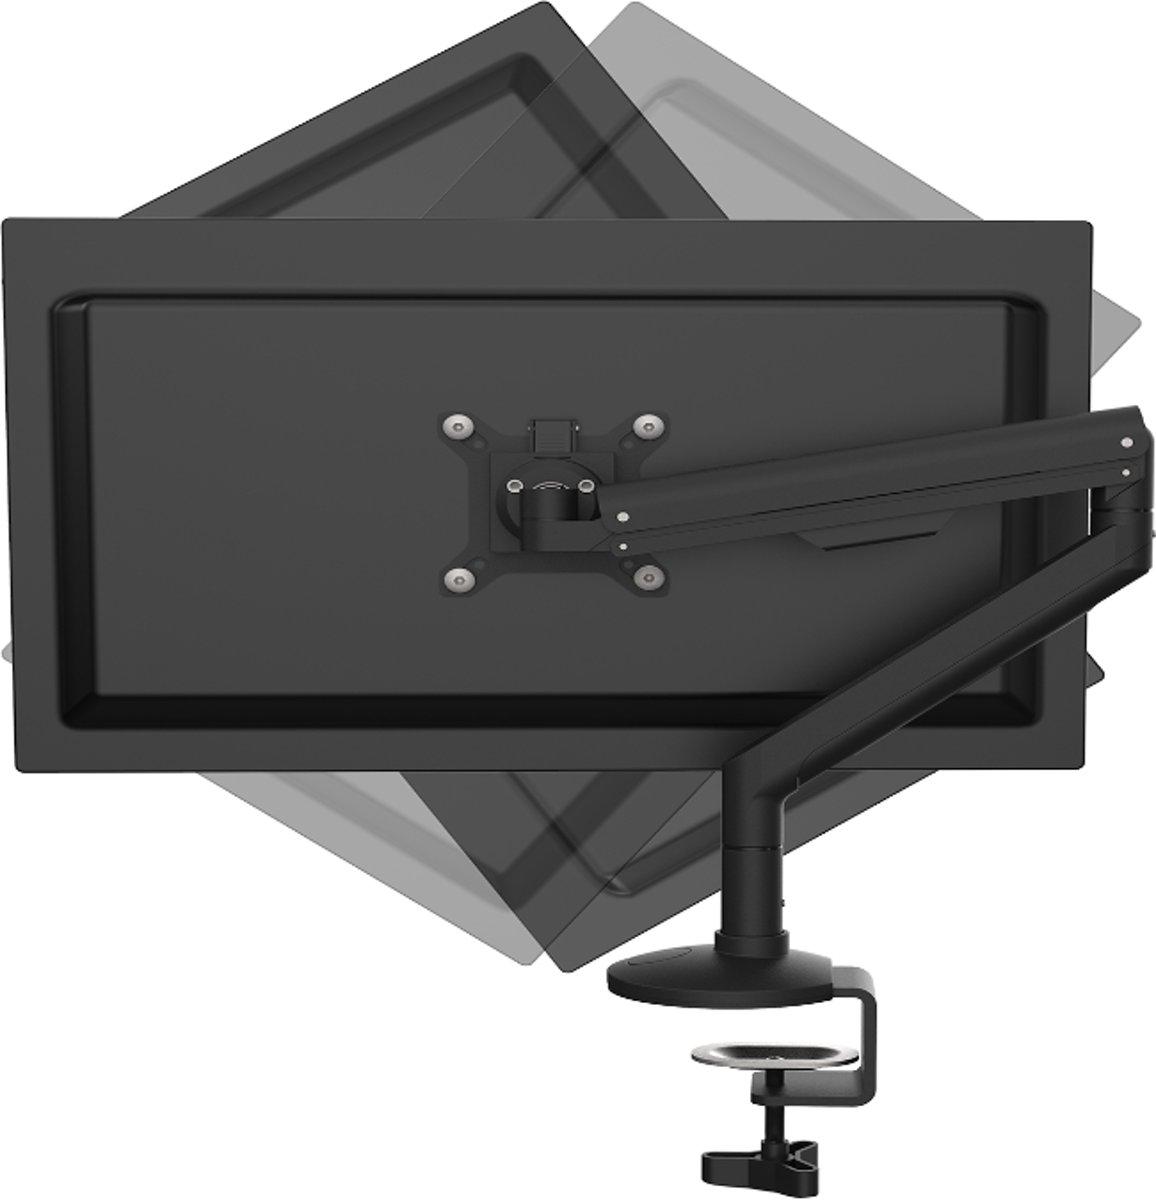 Ergonomische computerarm monitor pro